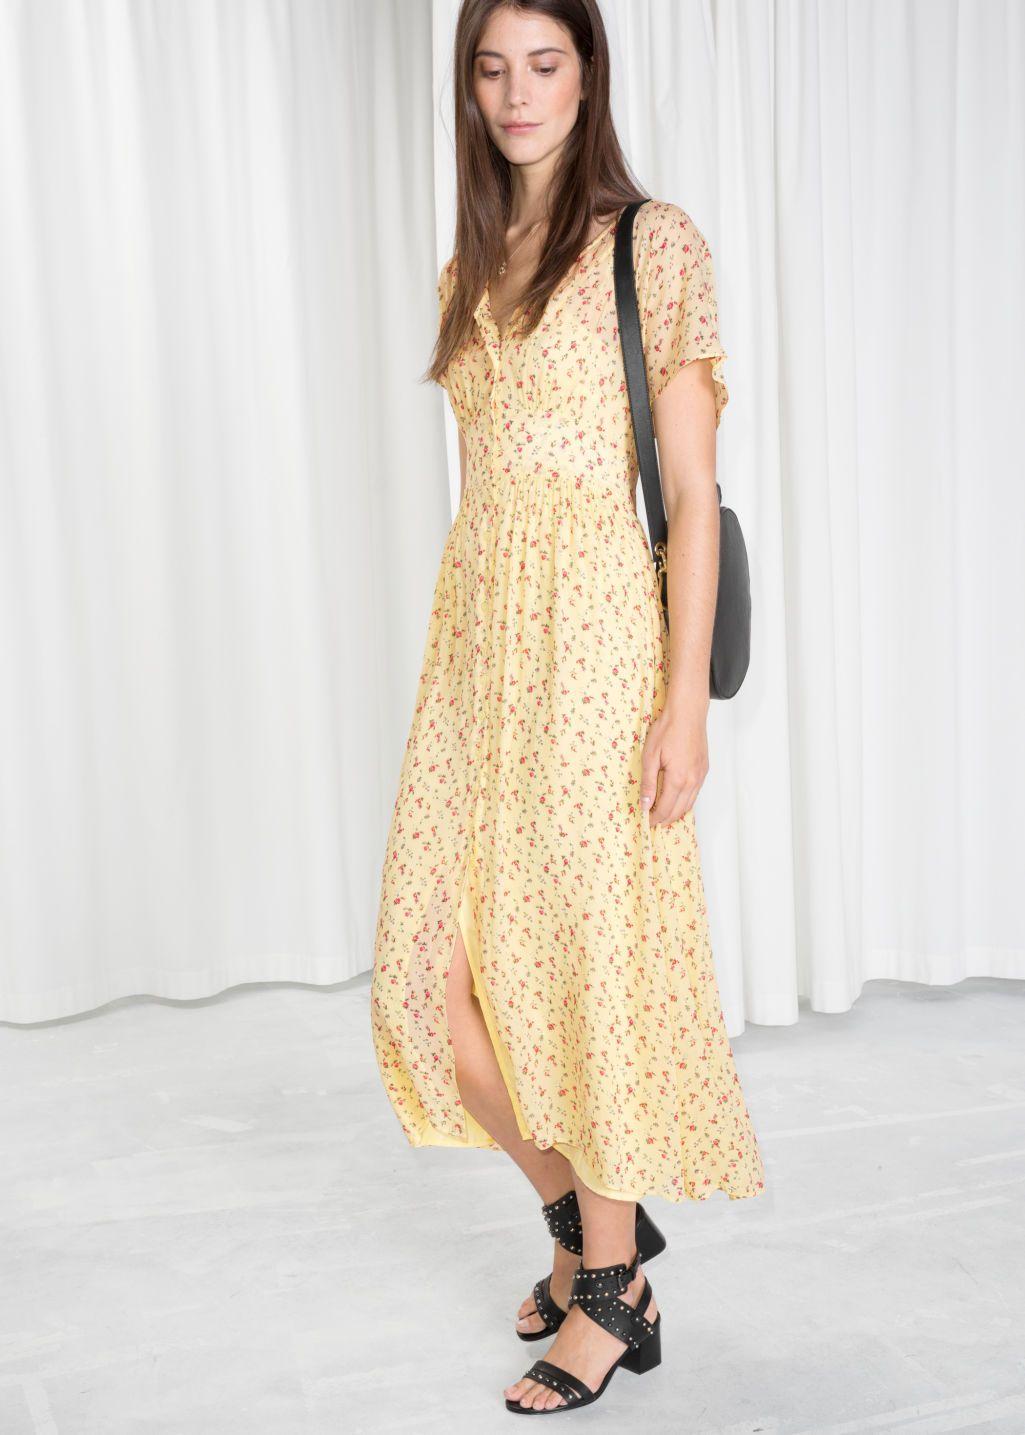 792469558e79 Floral Print Midi Dress - Light Yellow - Midi dresses -   Other Stories